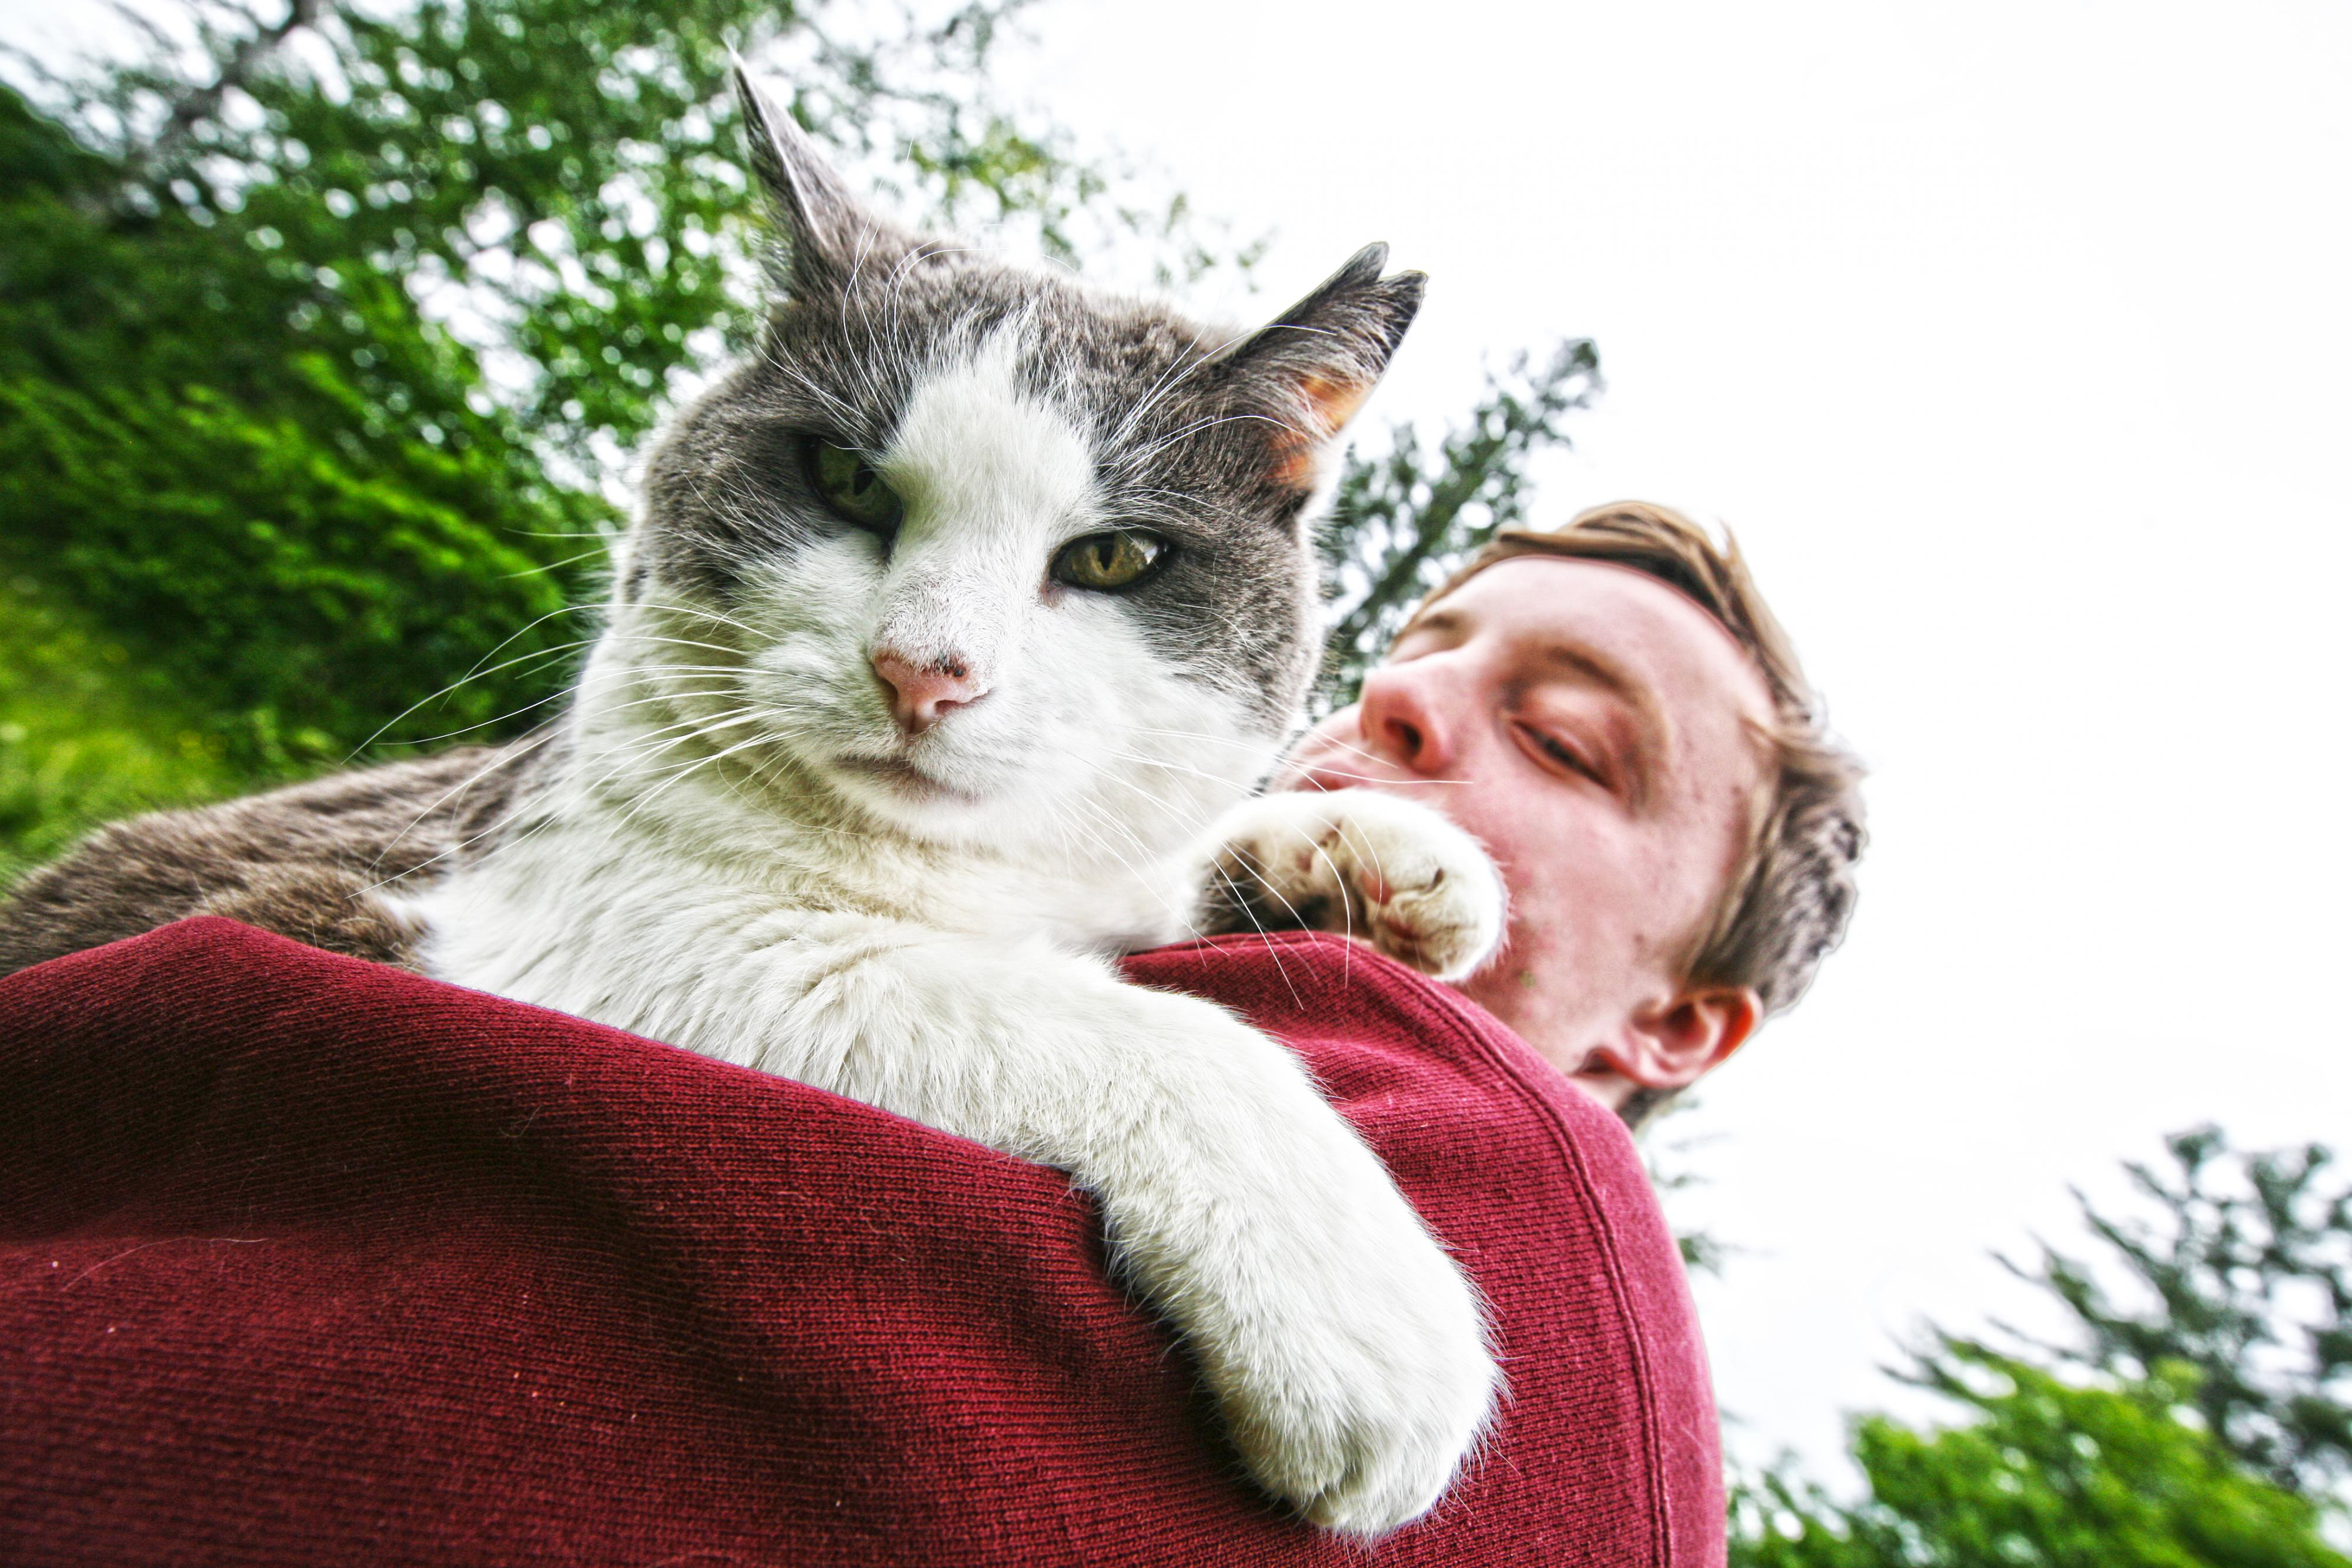 Yoga met katten is veel gezelliger. Foto: Sterling College/ Flickr.com